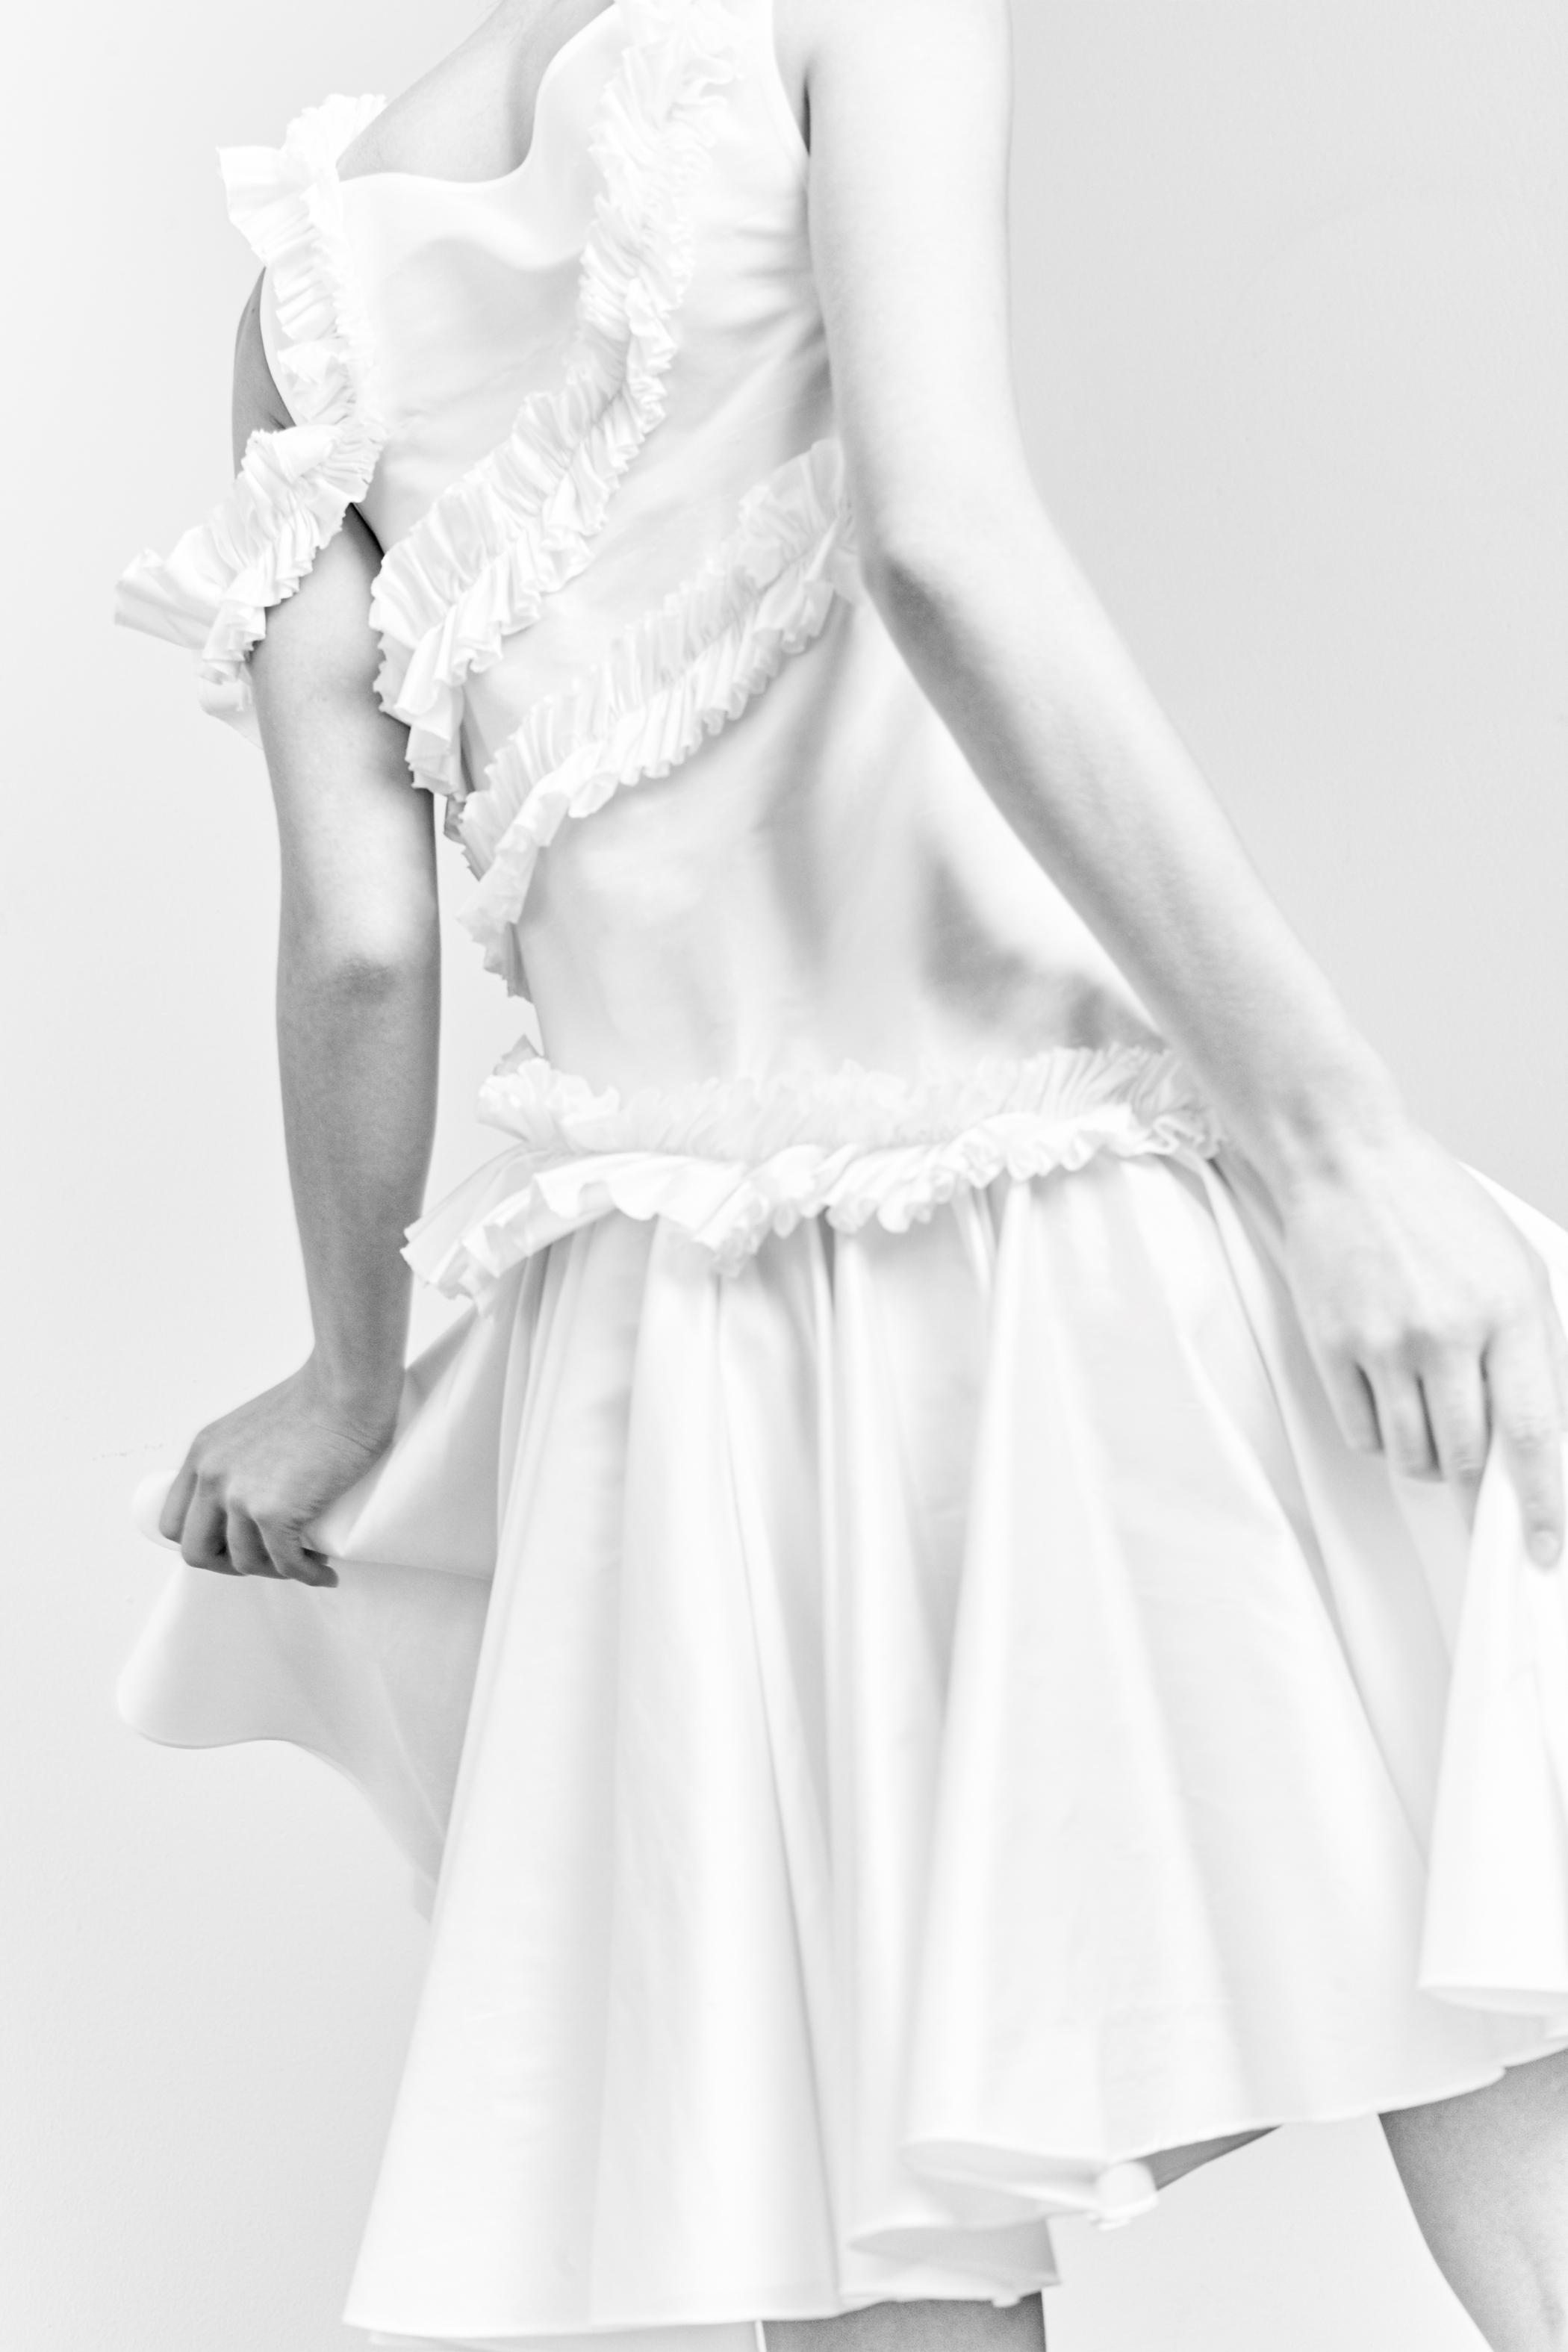 kelsey randall white silk shantung asymmetrical ruffle circle skirt cocktail party bridesmaid dress